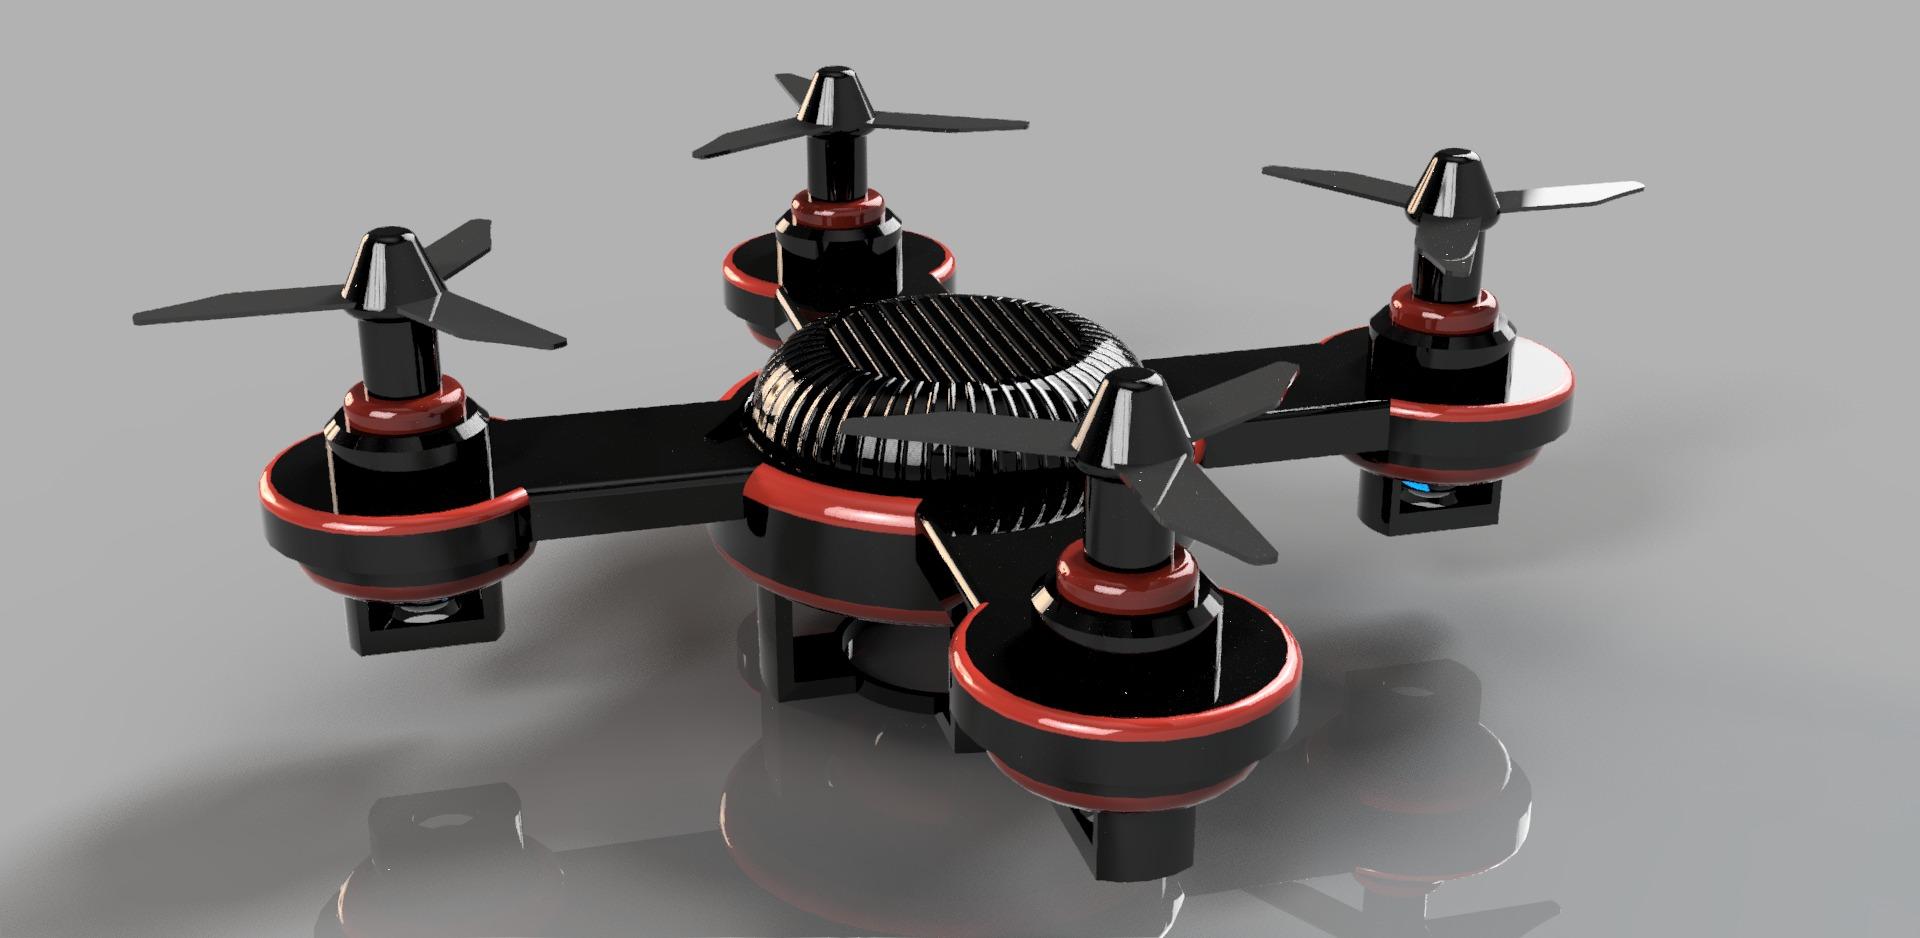 Dron Ctl2 1 Autodesk Online Gallery